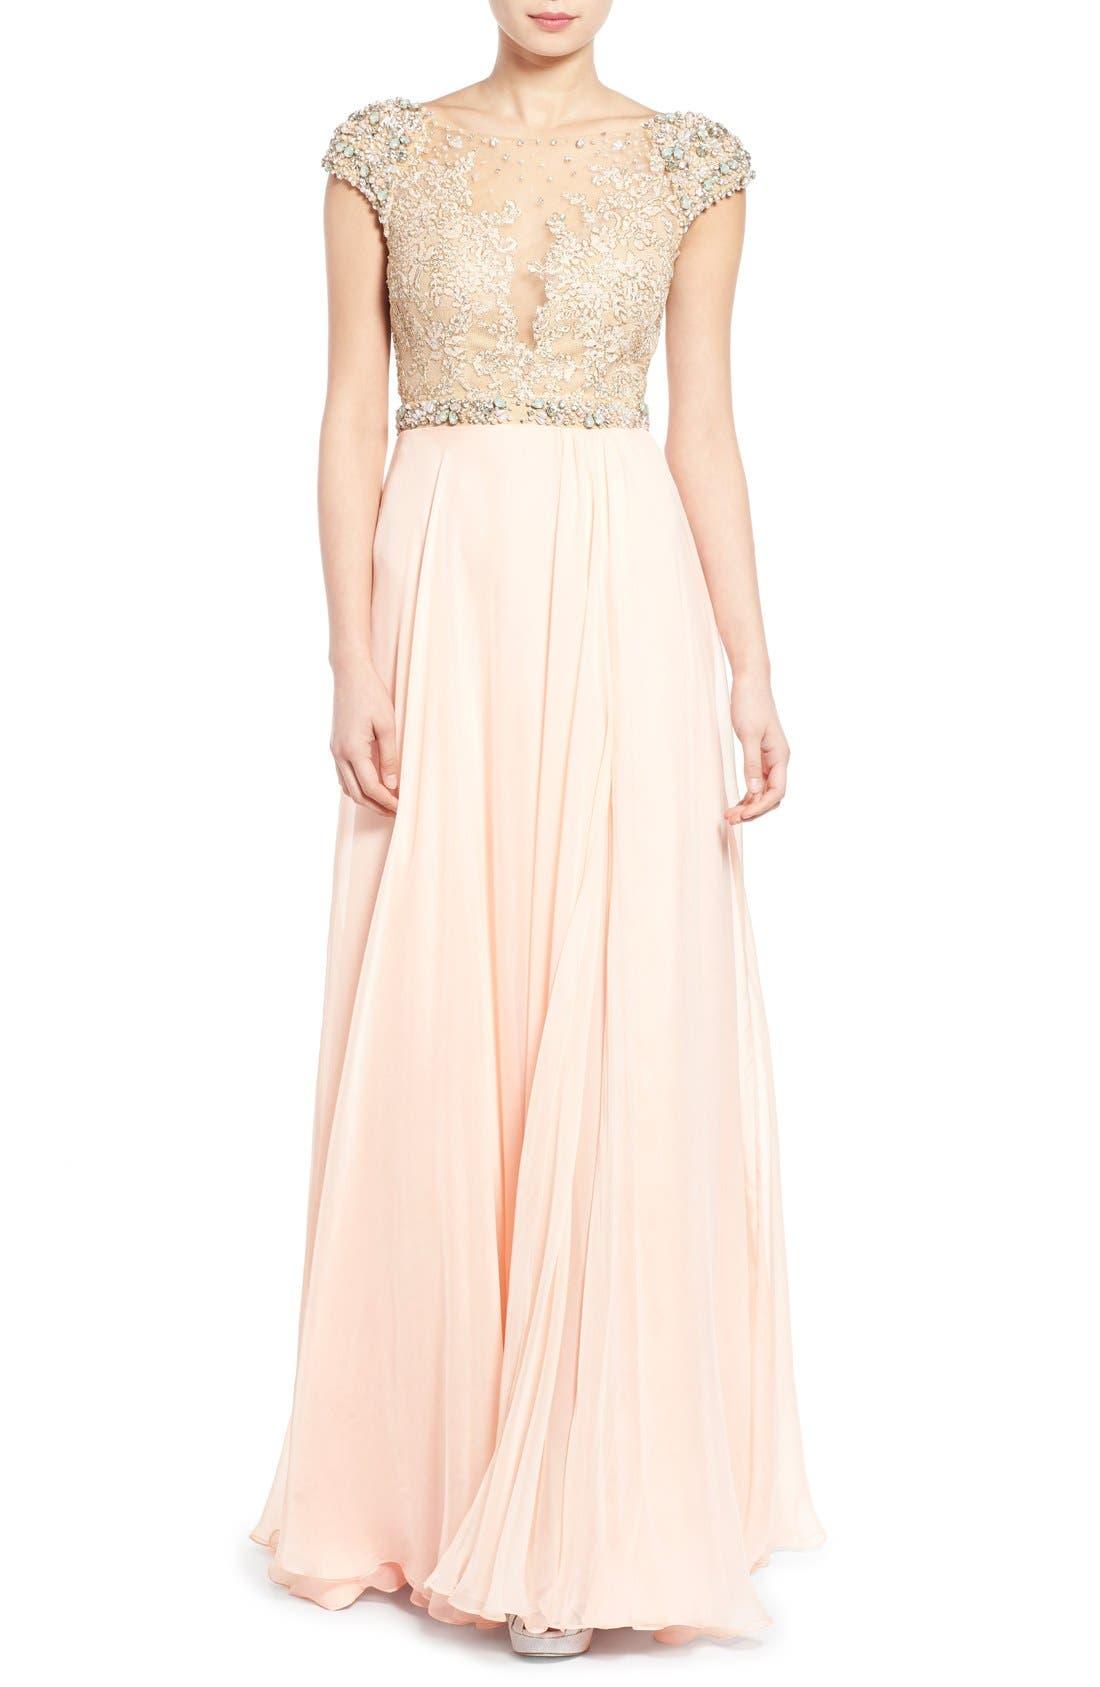 Alternate Image 1 Selected - Mac Duggal 'Gladys' Embellished Gown